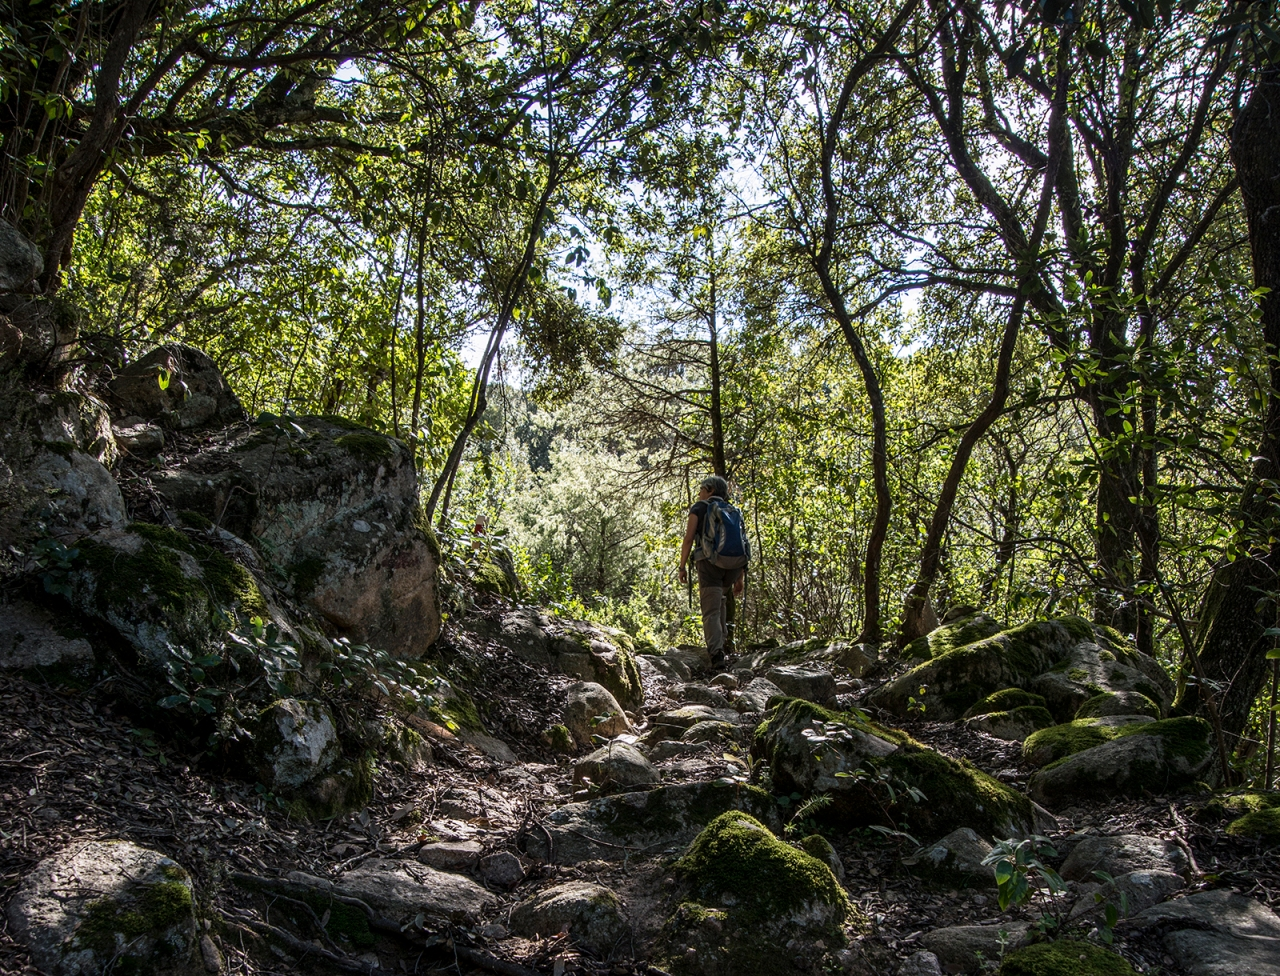 The path crosses a dense wood